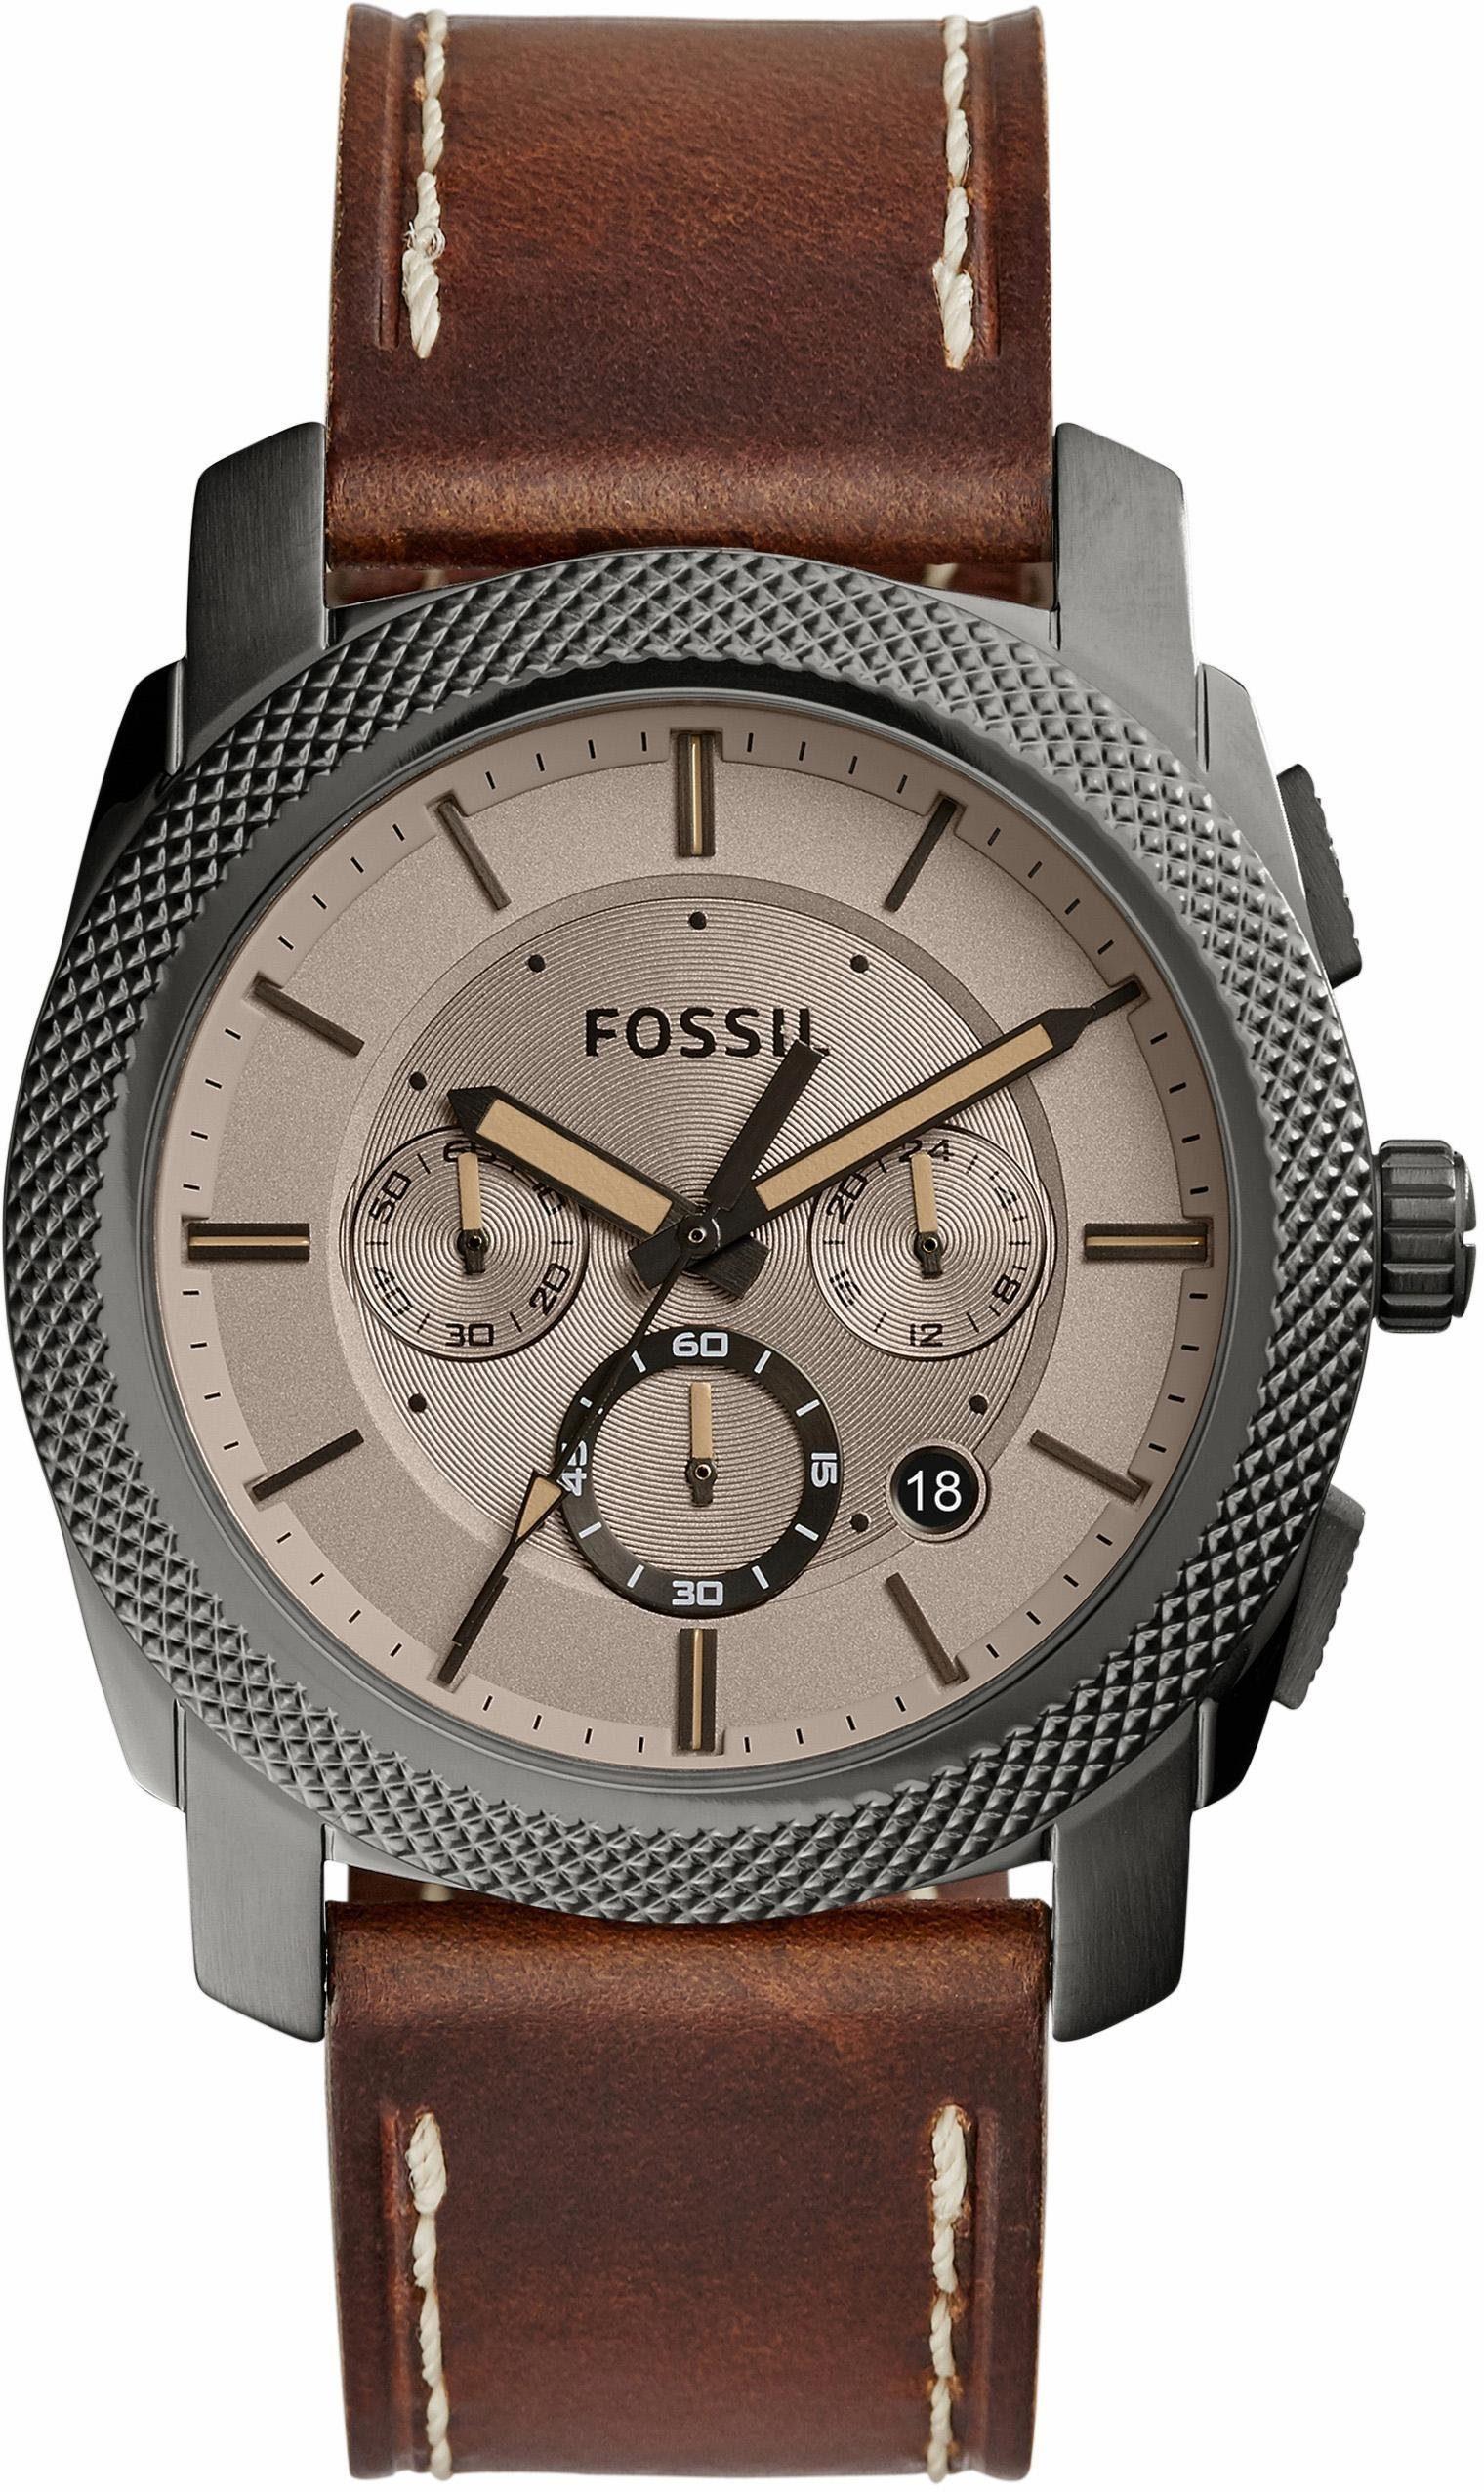 Fossil Chronograph »MACHINE, FS5215«